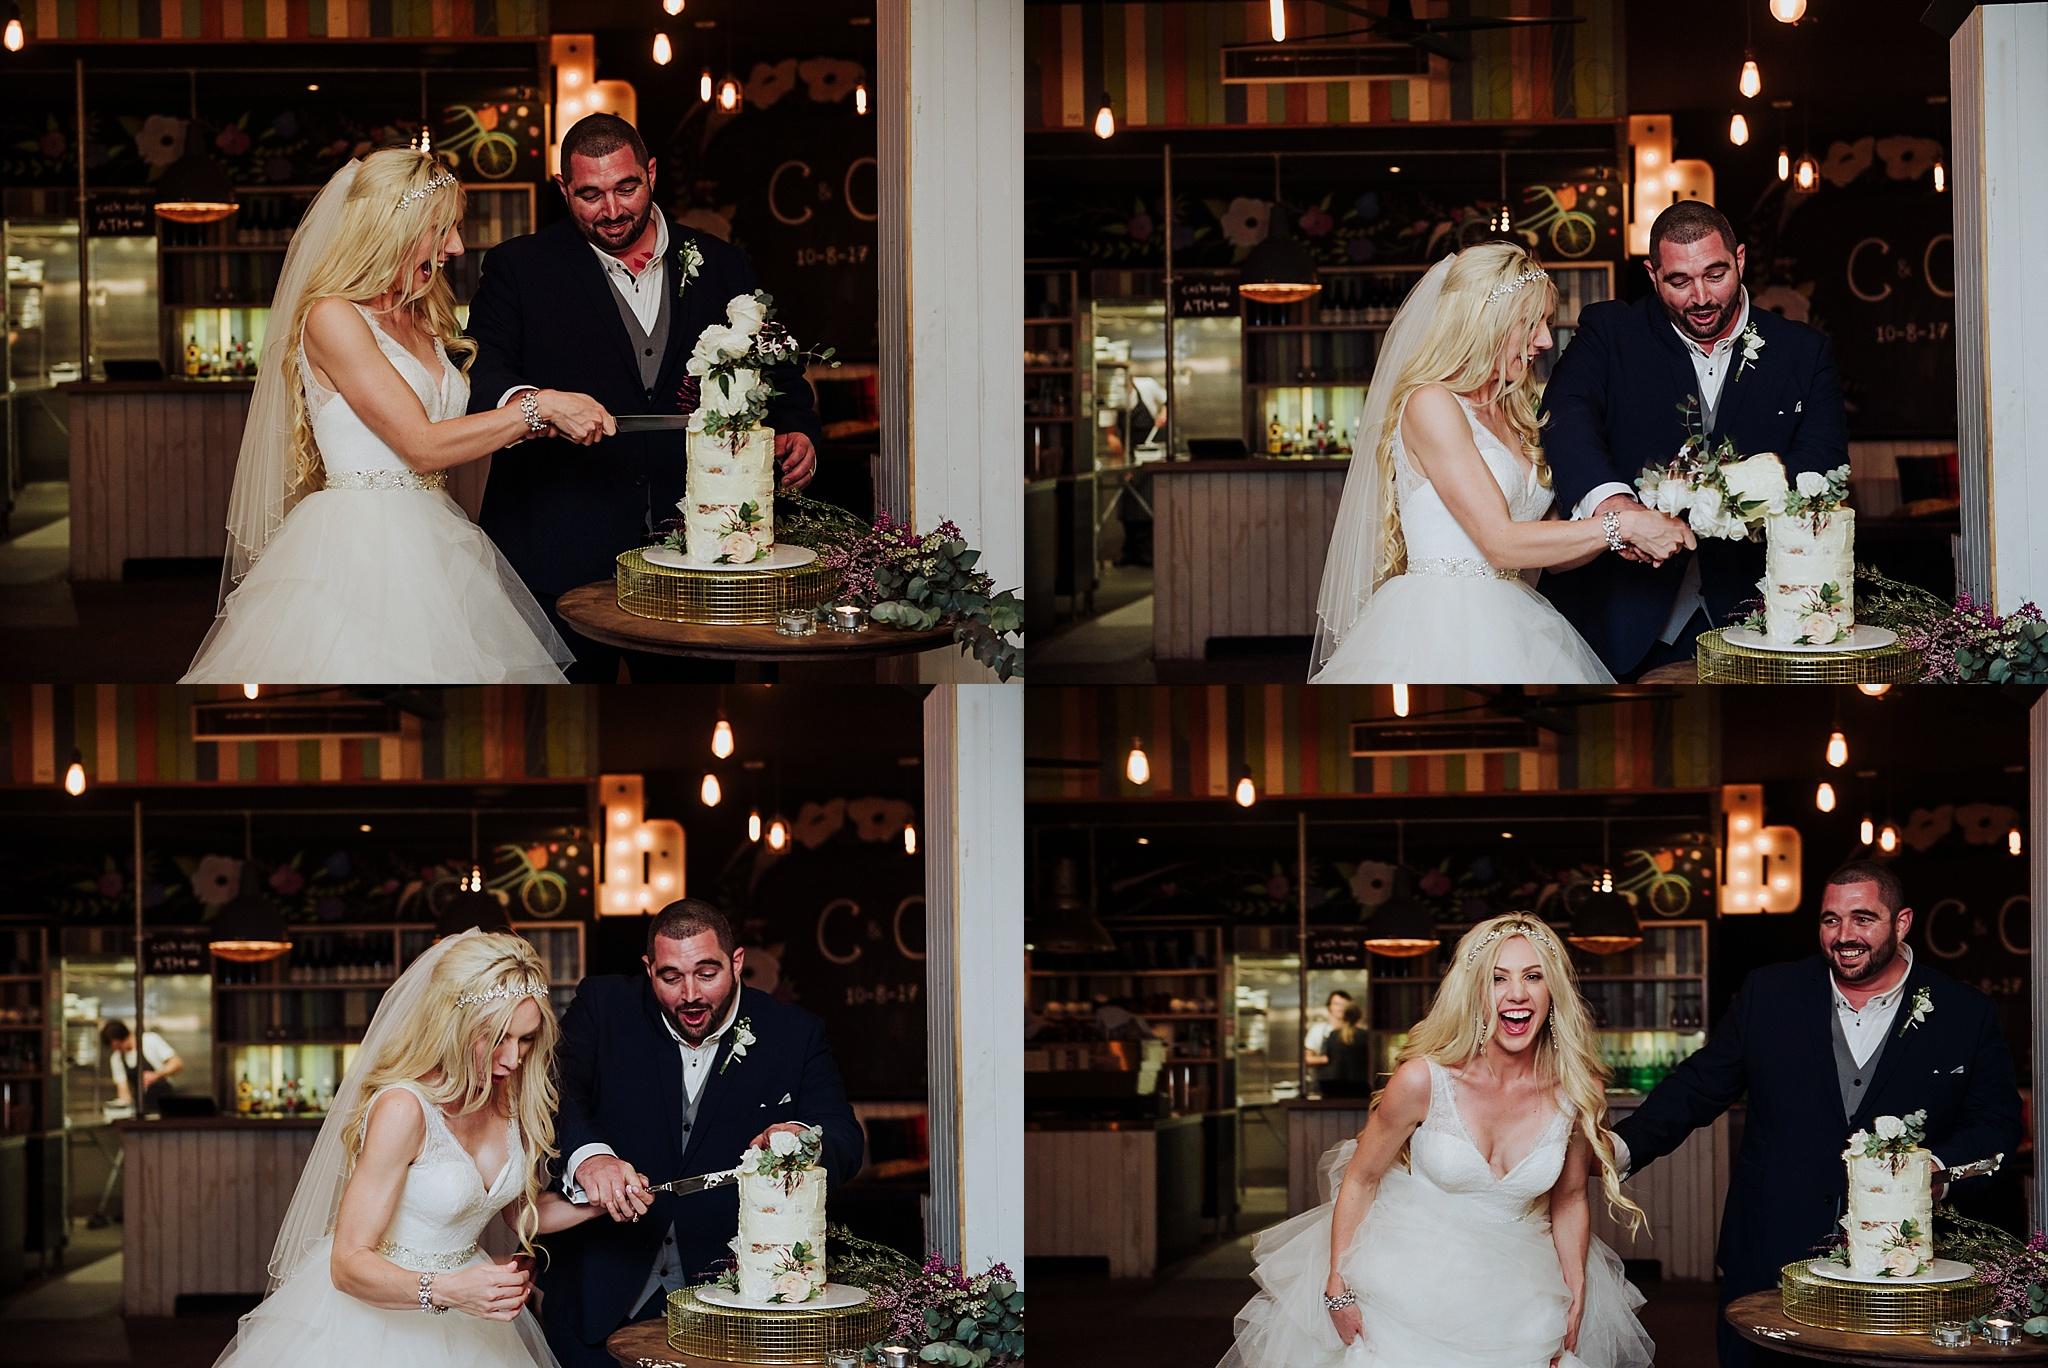 Belongil_Byron_Bay_Restaurant_Wedding_cake_fail_0004.jpg